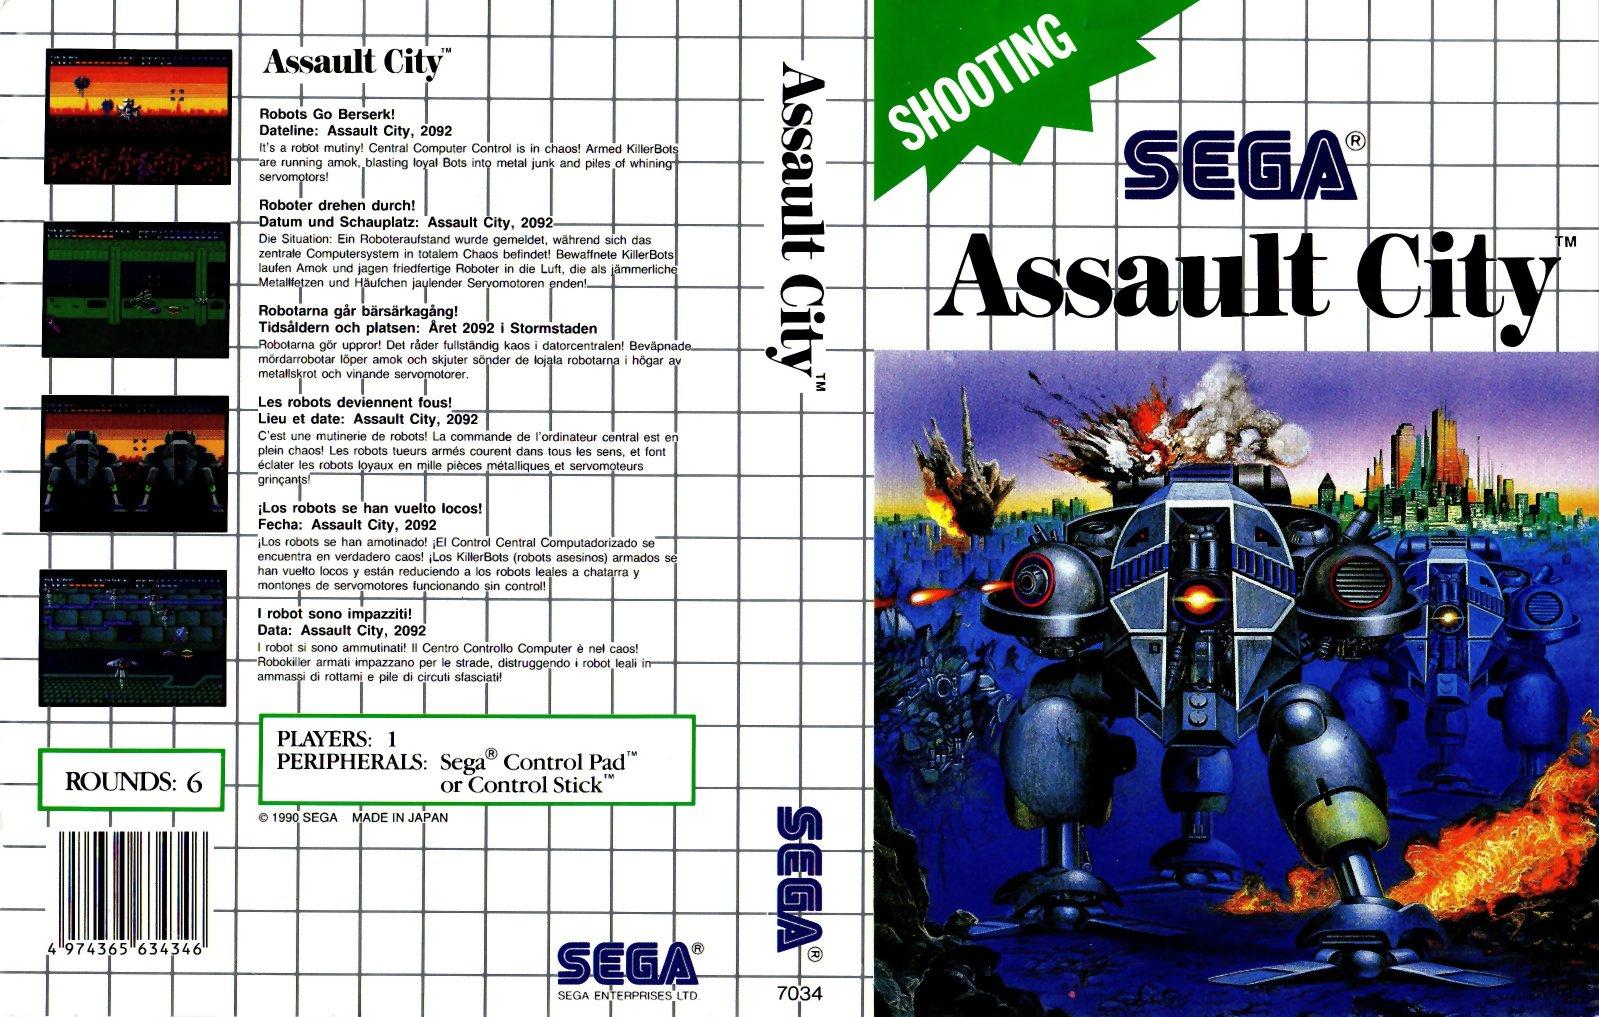 Sega Master System A Game Covers Box Scans Box Art CD ...